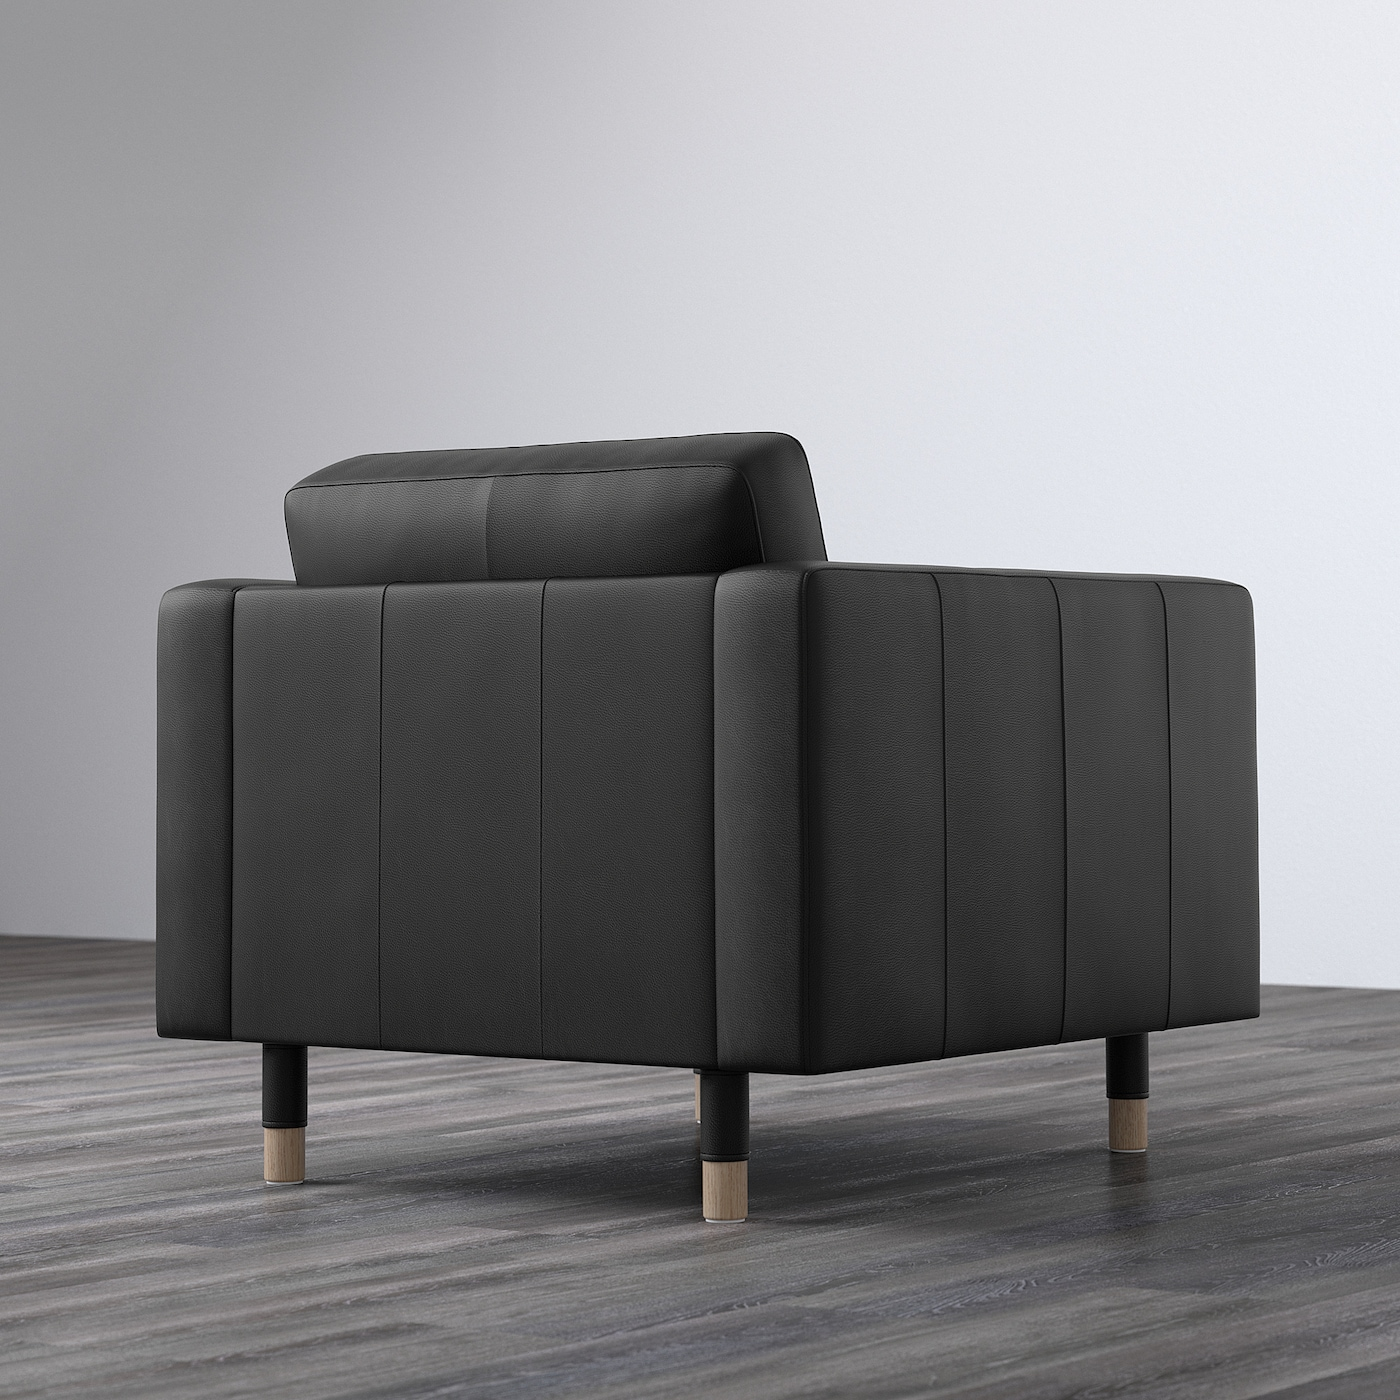 LANDSKRONA Fåtölj, GrannBomstad gyllenbrun, Bredd: 89 cm IKEA